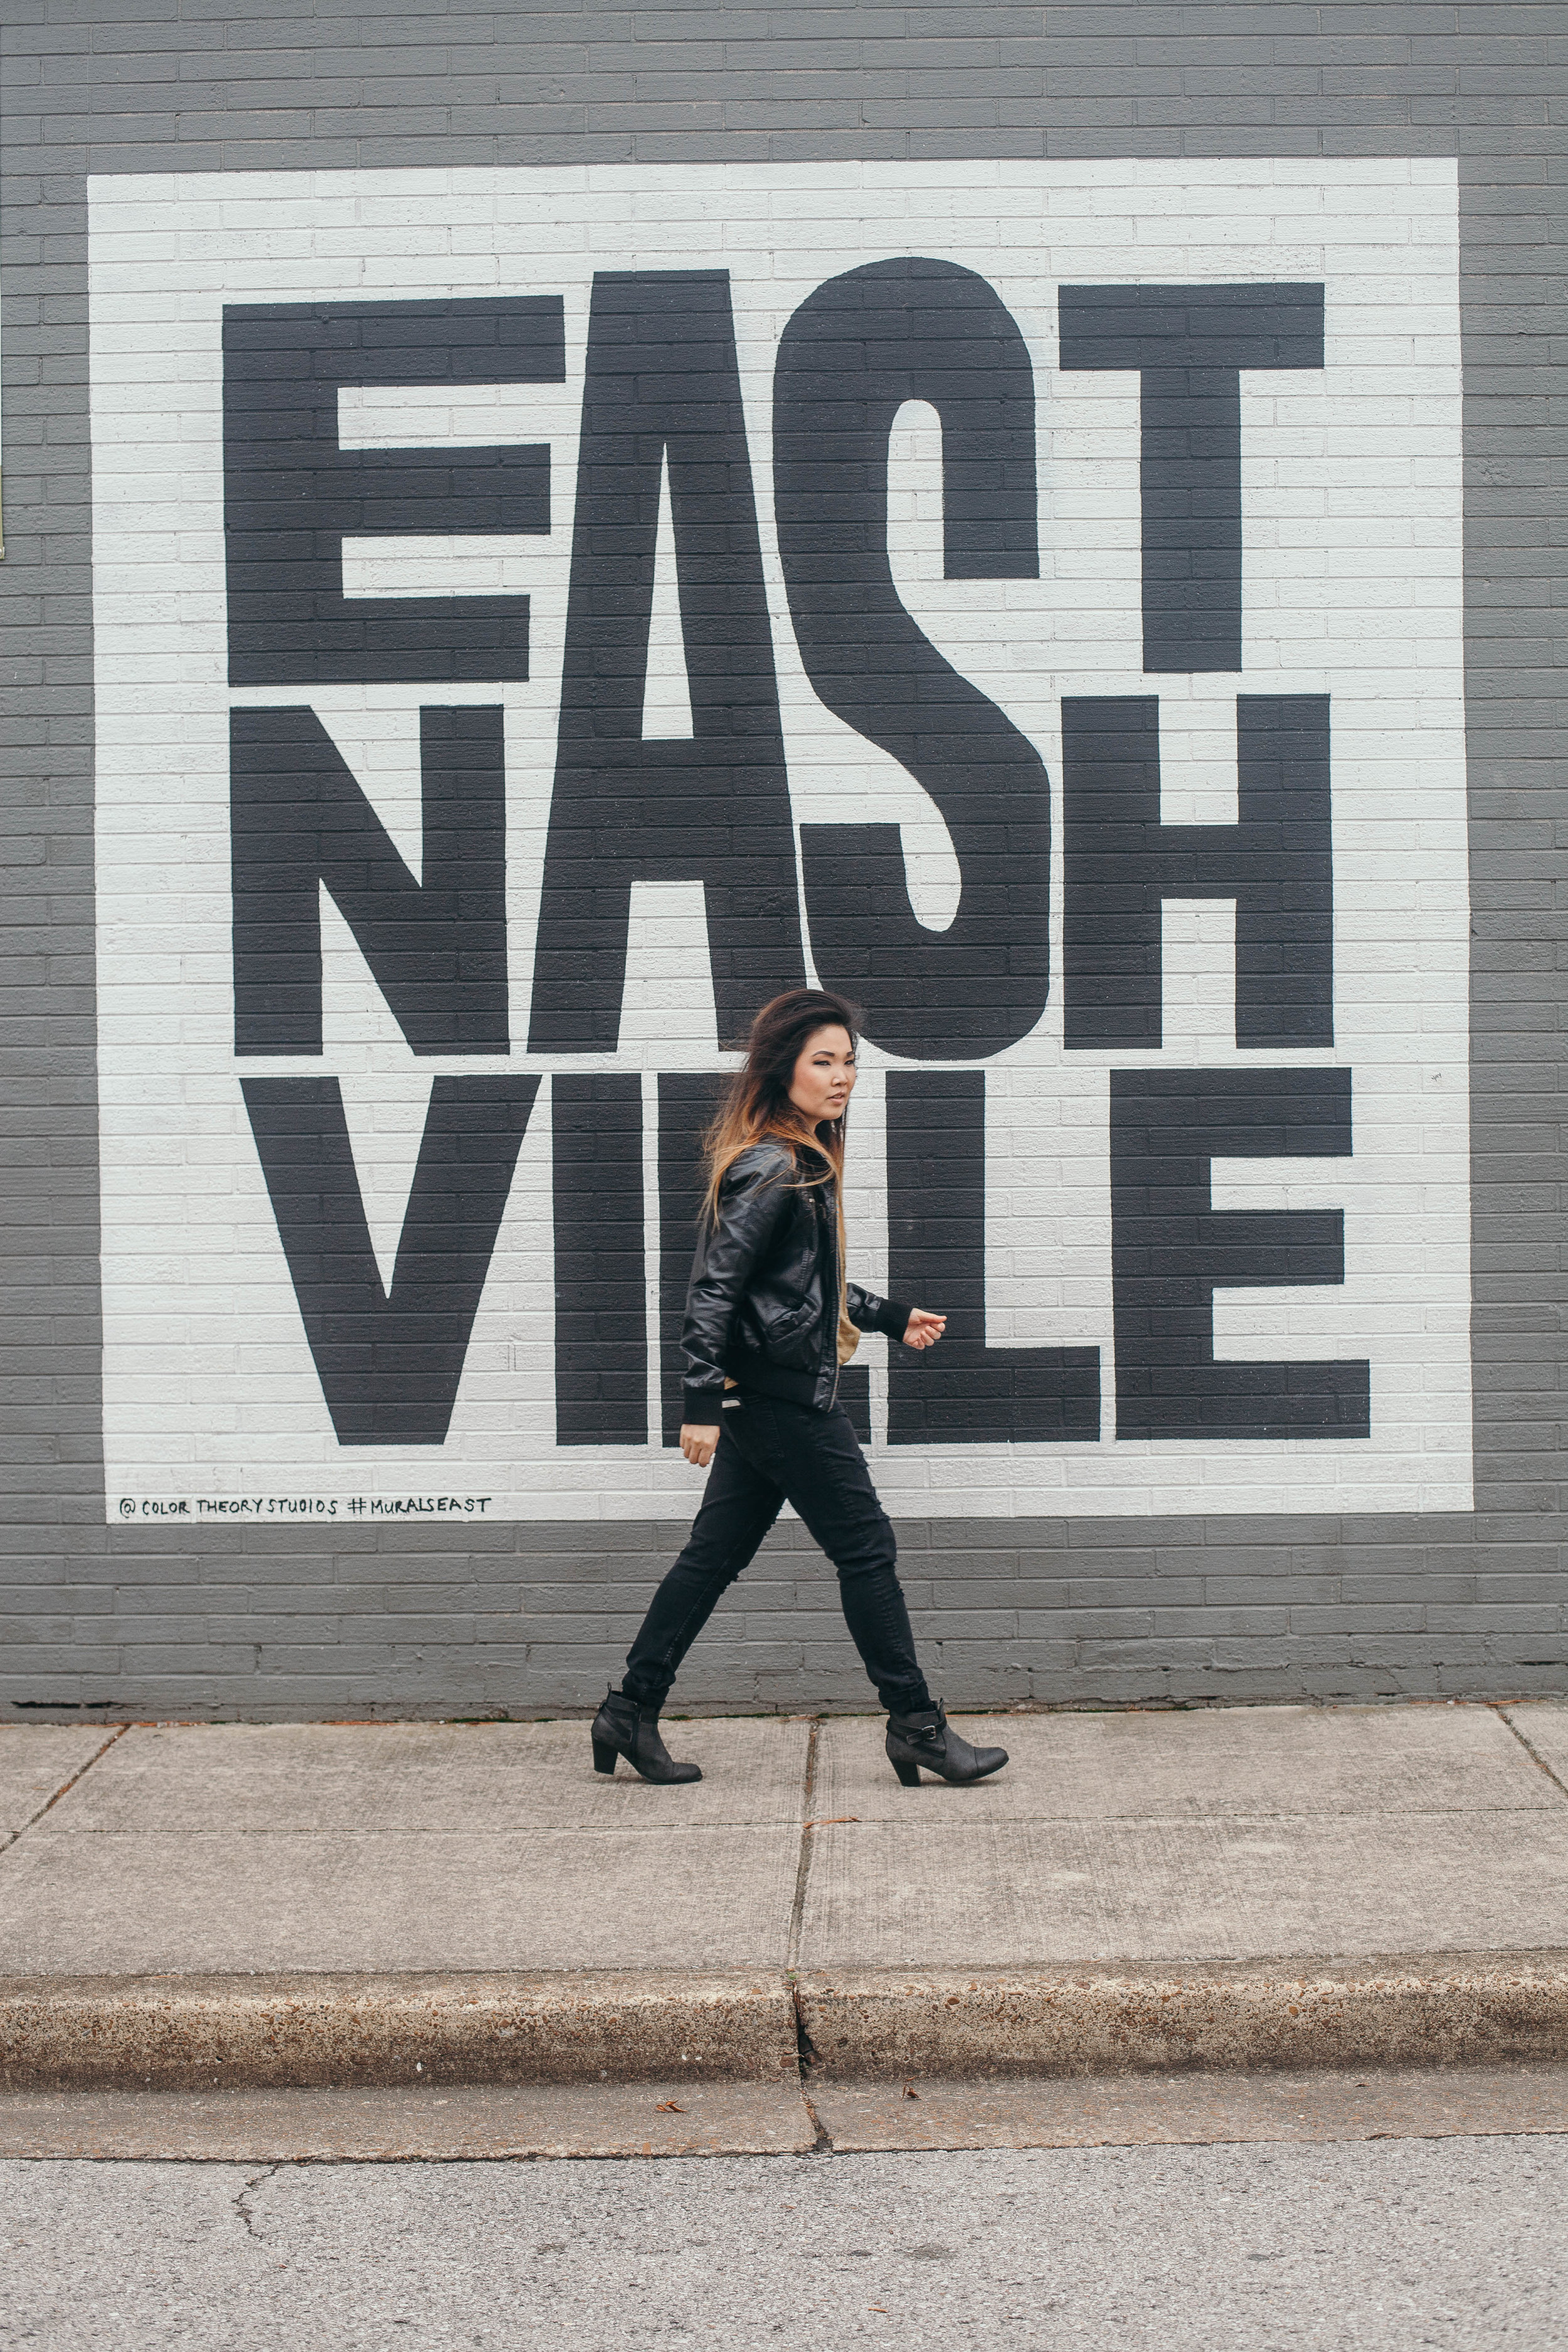 portrait-TN-nashville-woman-6.jpg